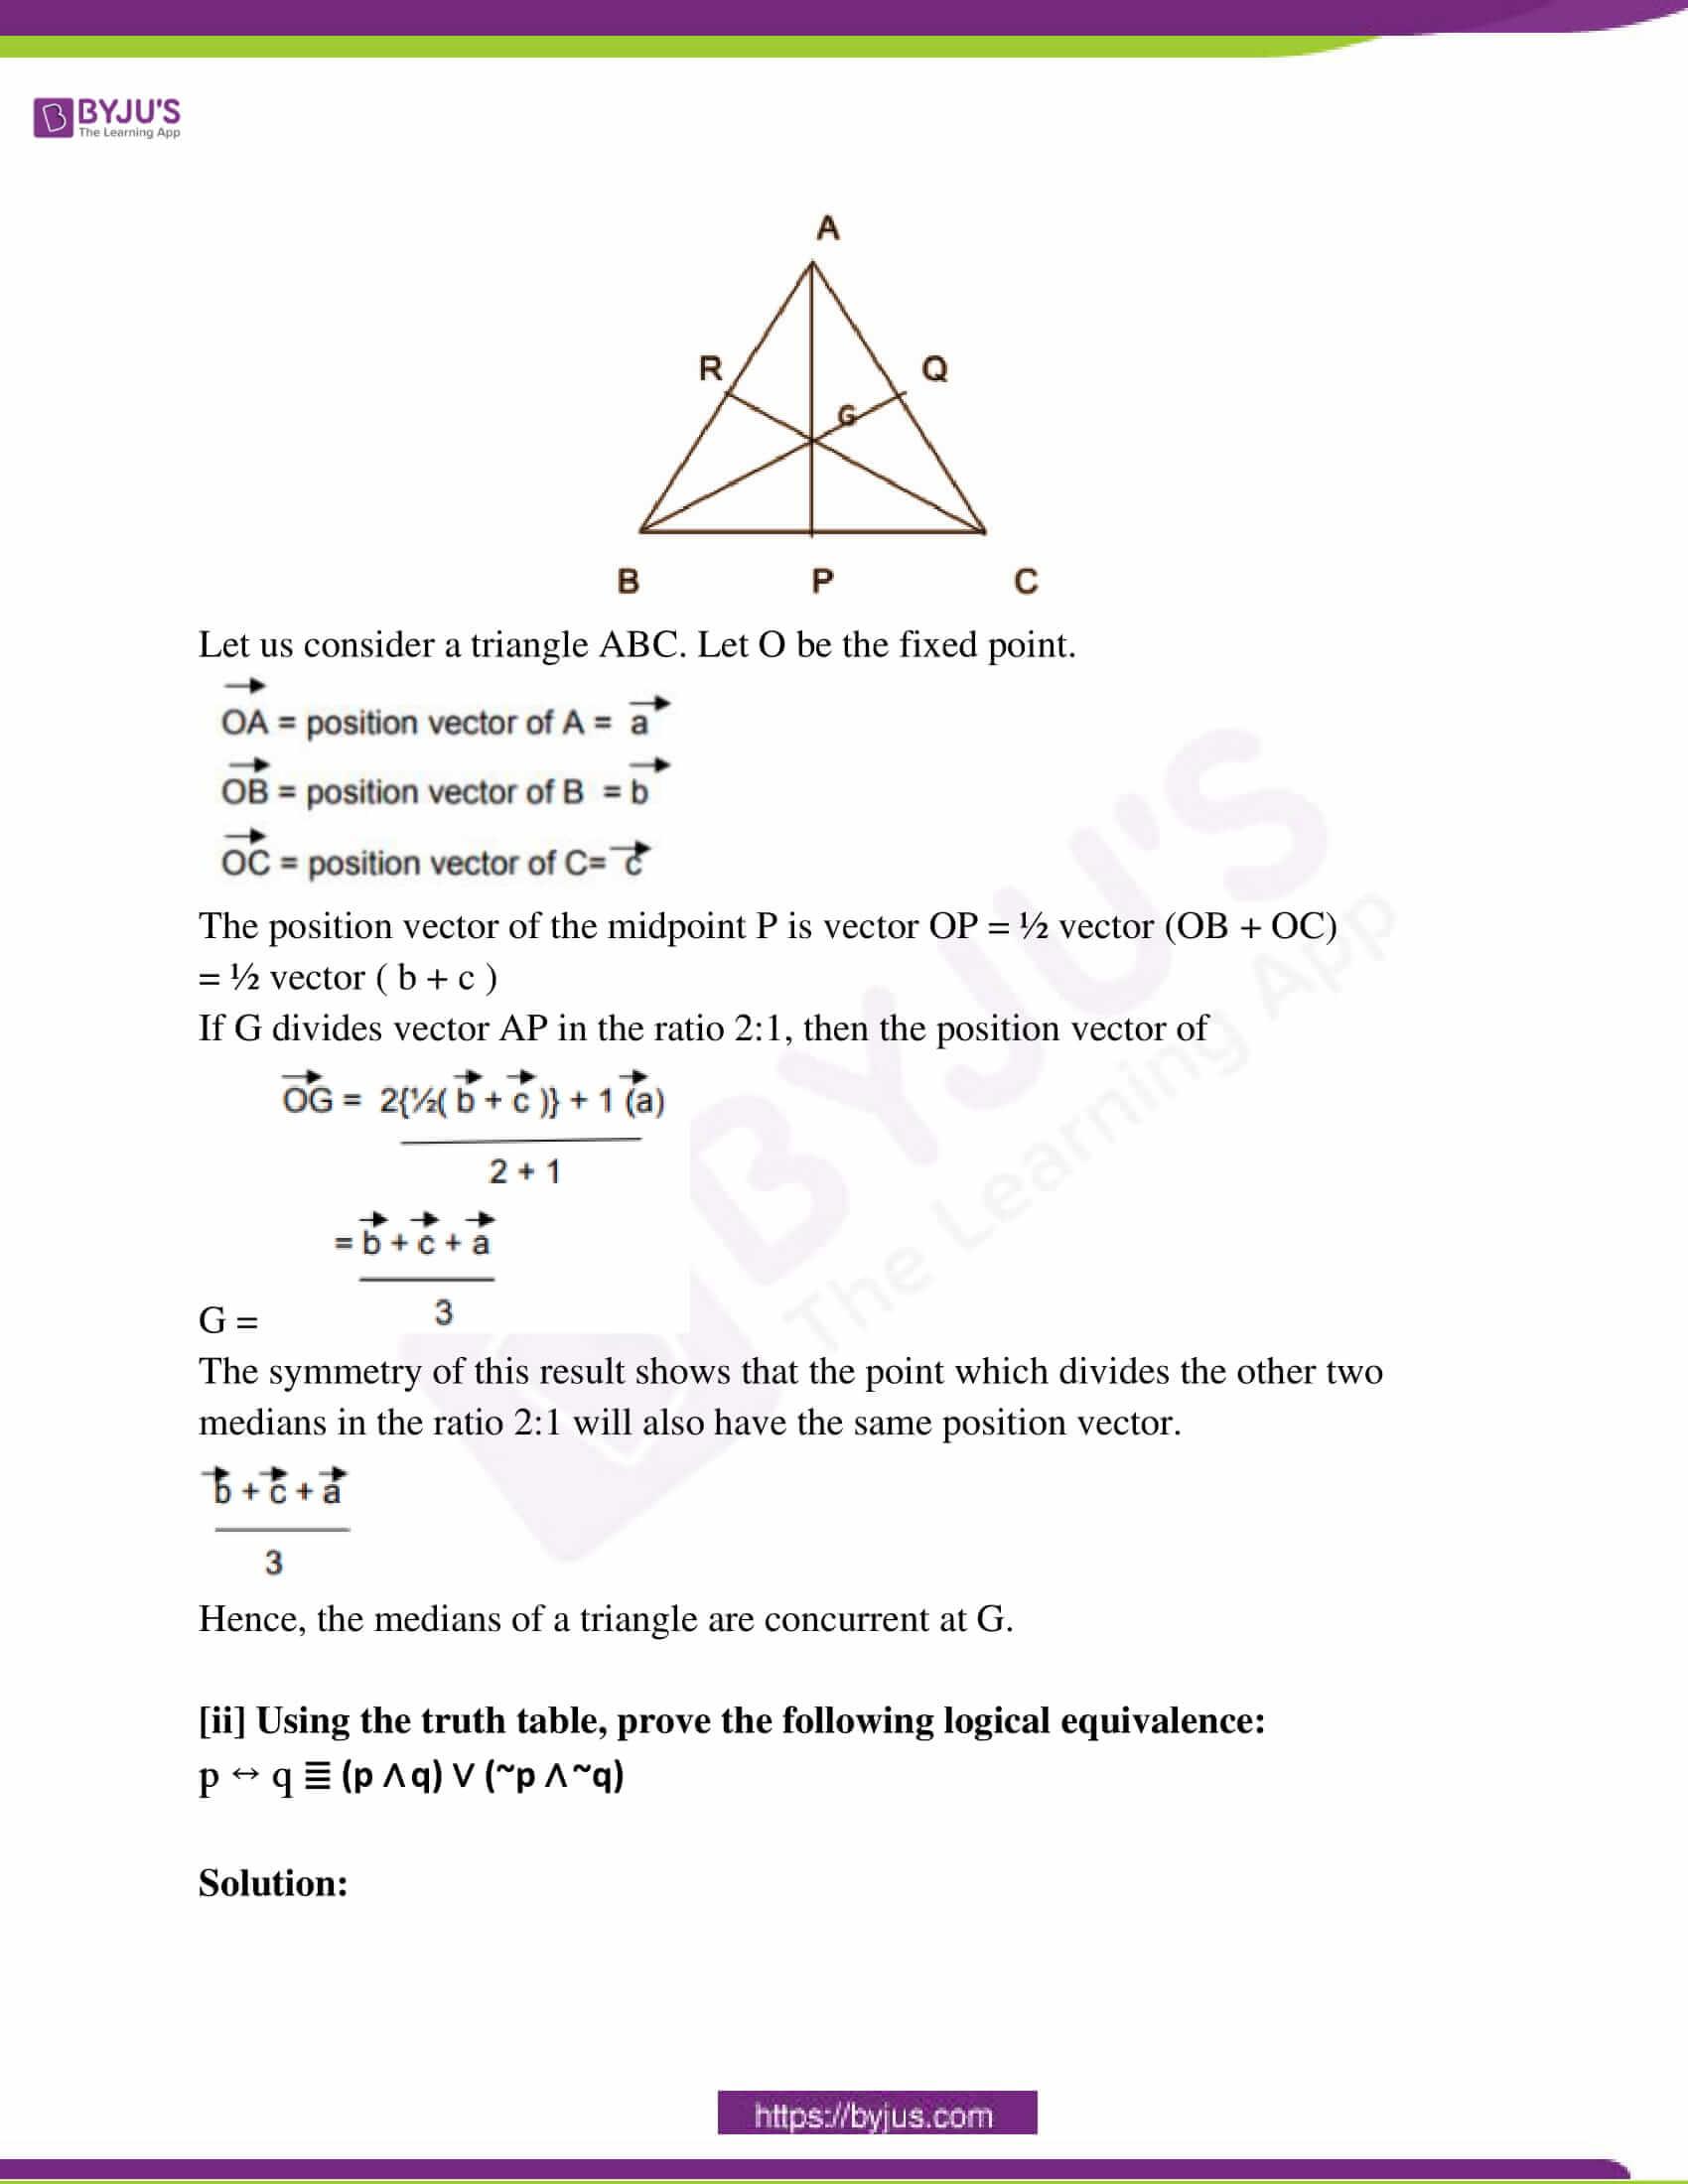 maharashtra class 12 exam question paper solutions march 2018 05